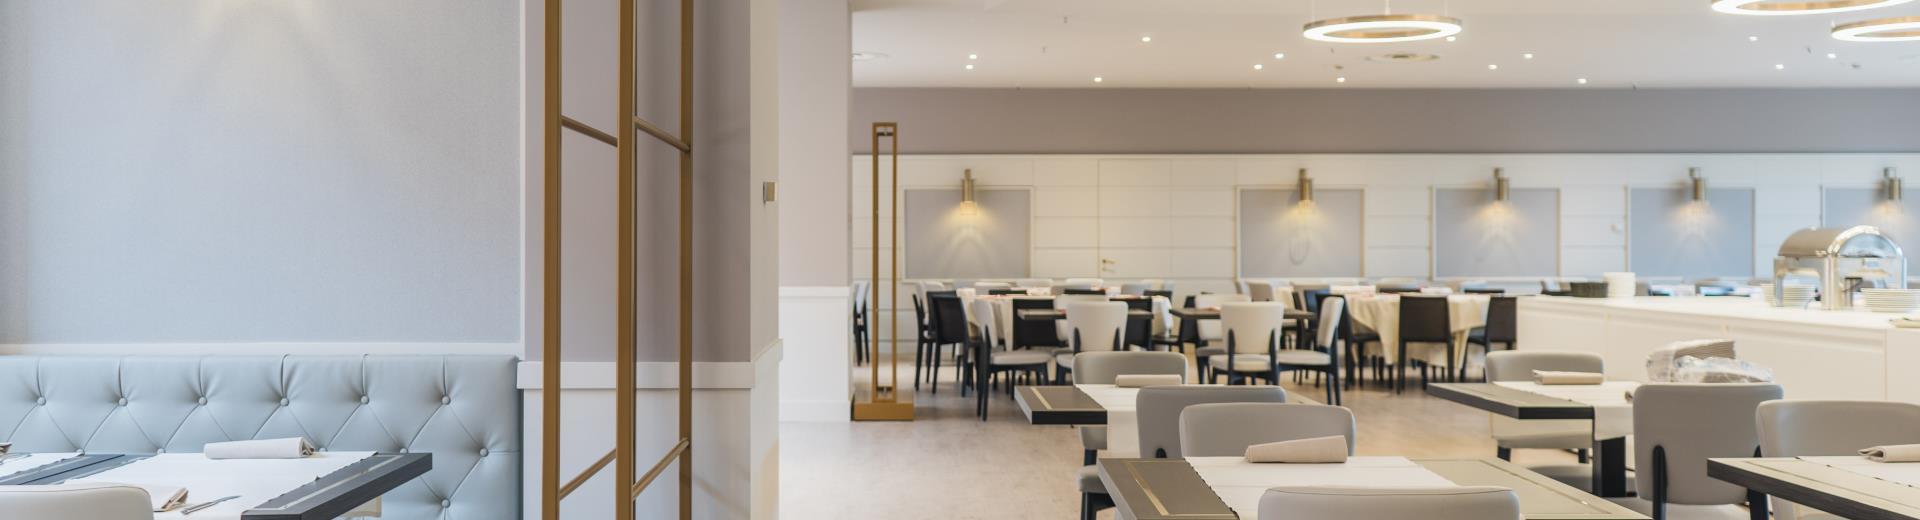 Hotel in verona best western ctc hotel verona hotel for Designhotel verona